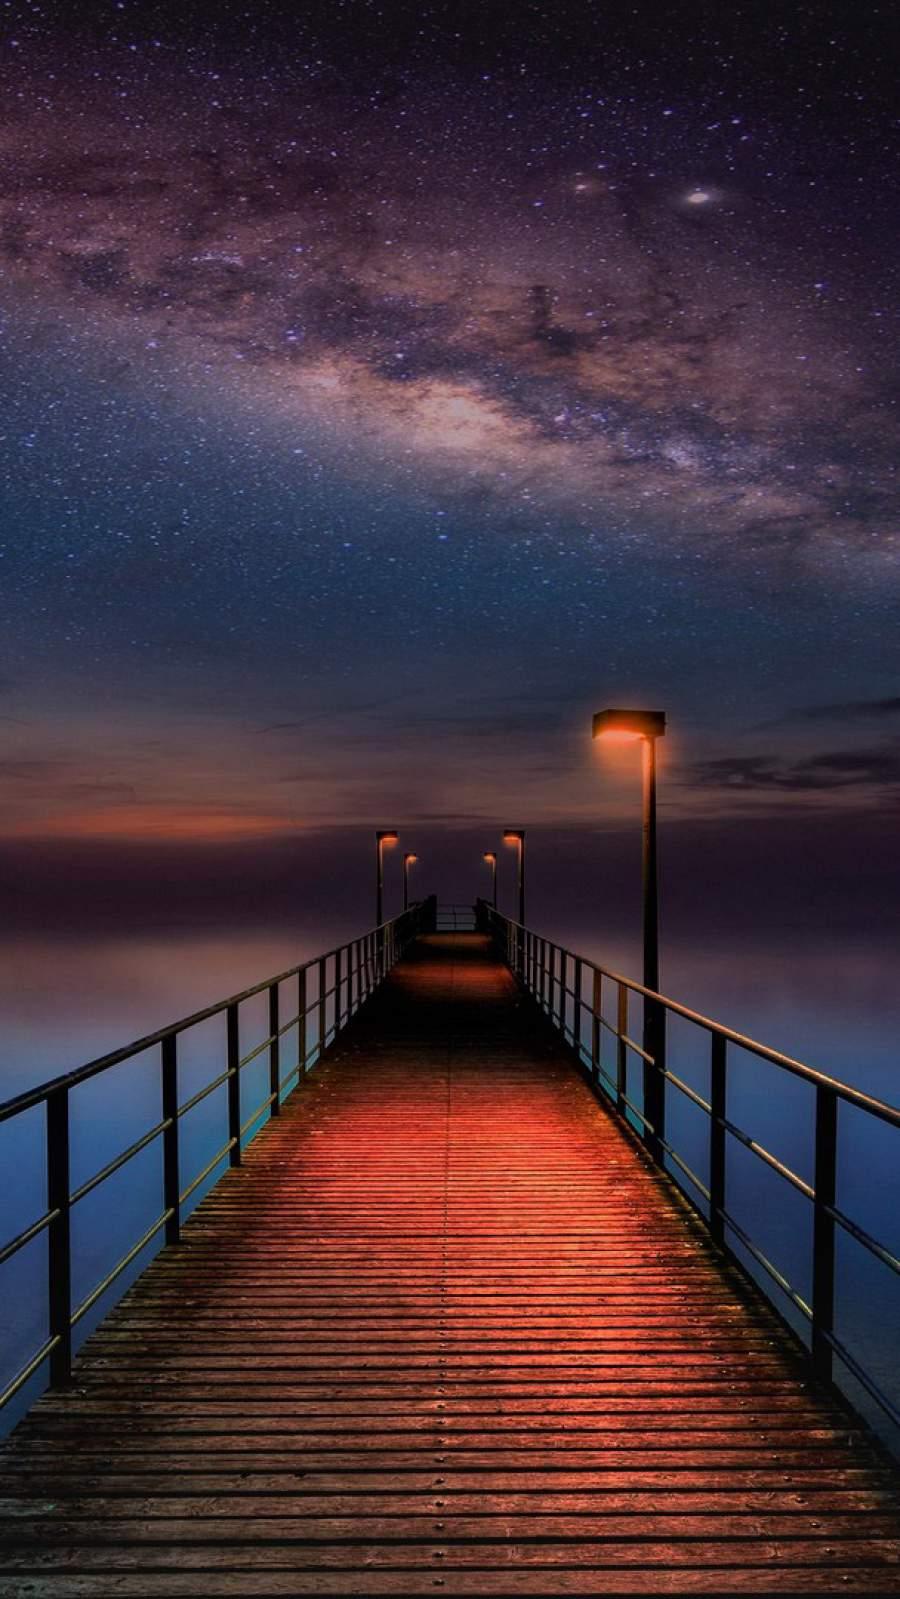 Night Star View Pier